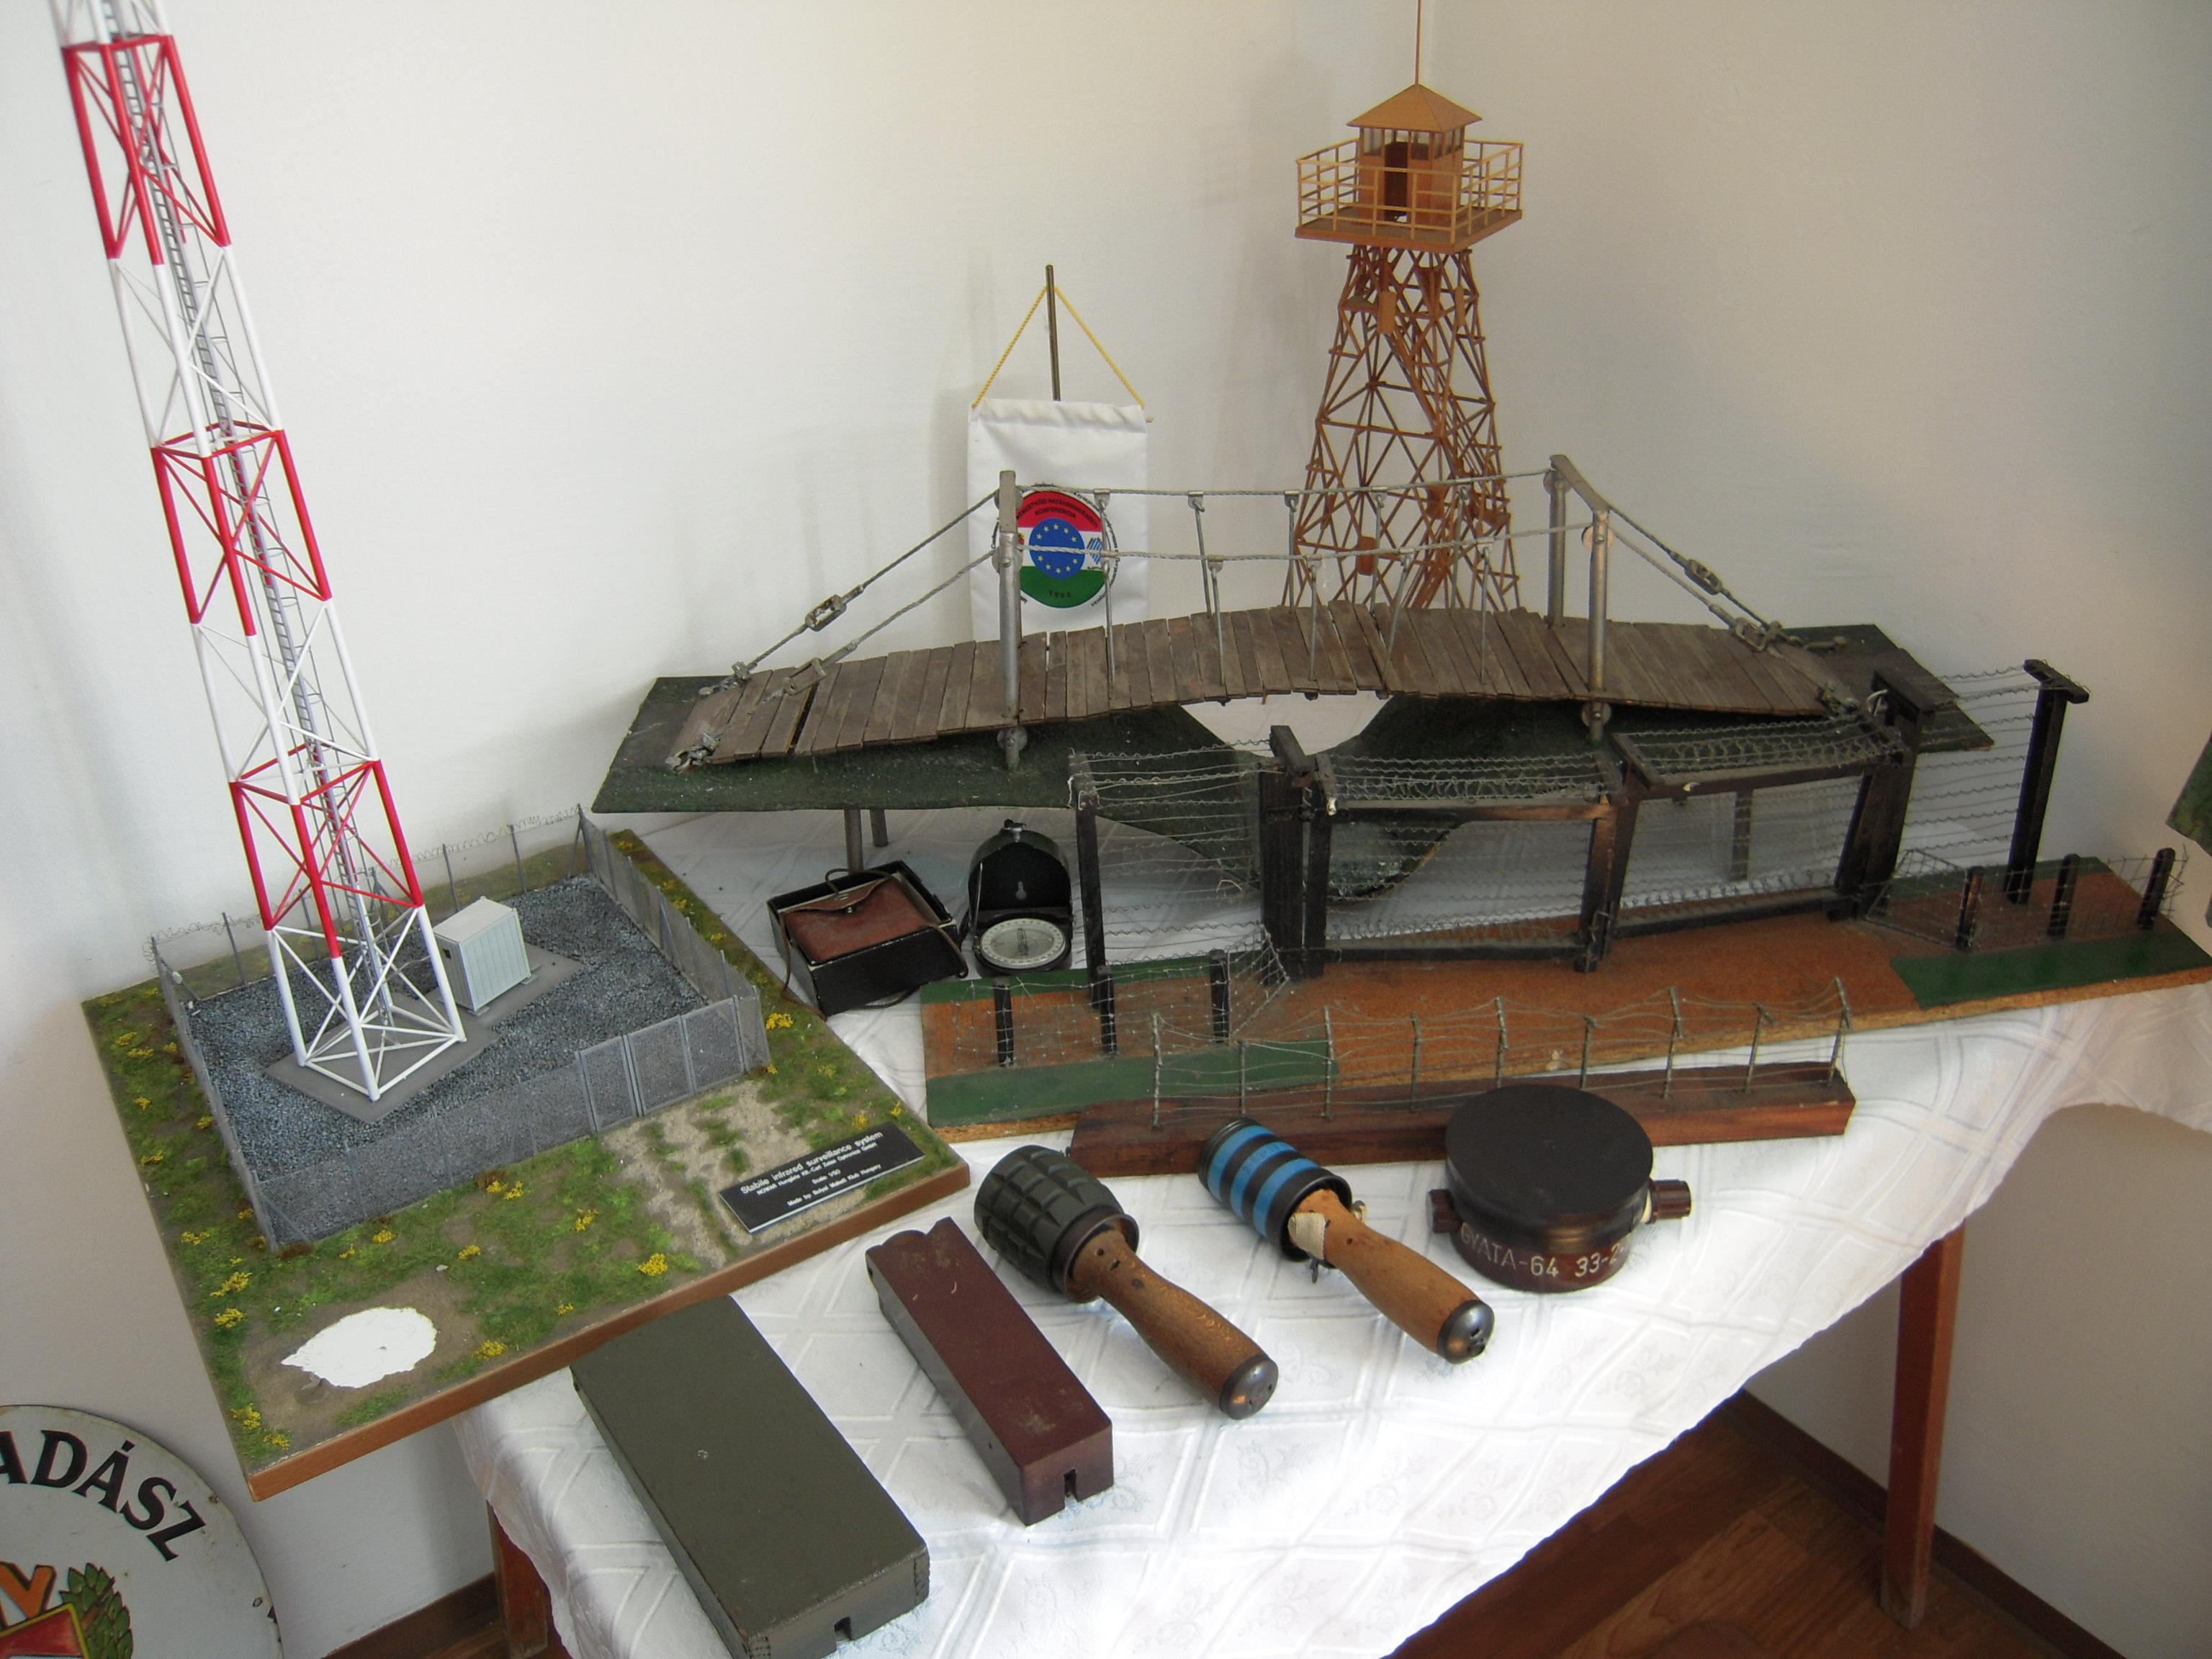 határőr múzeumi tárgyak.JPG